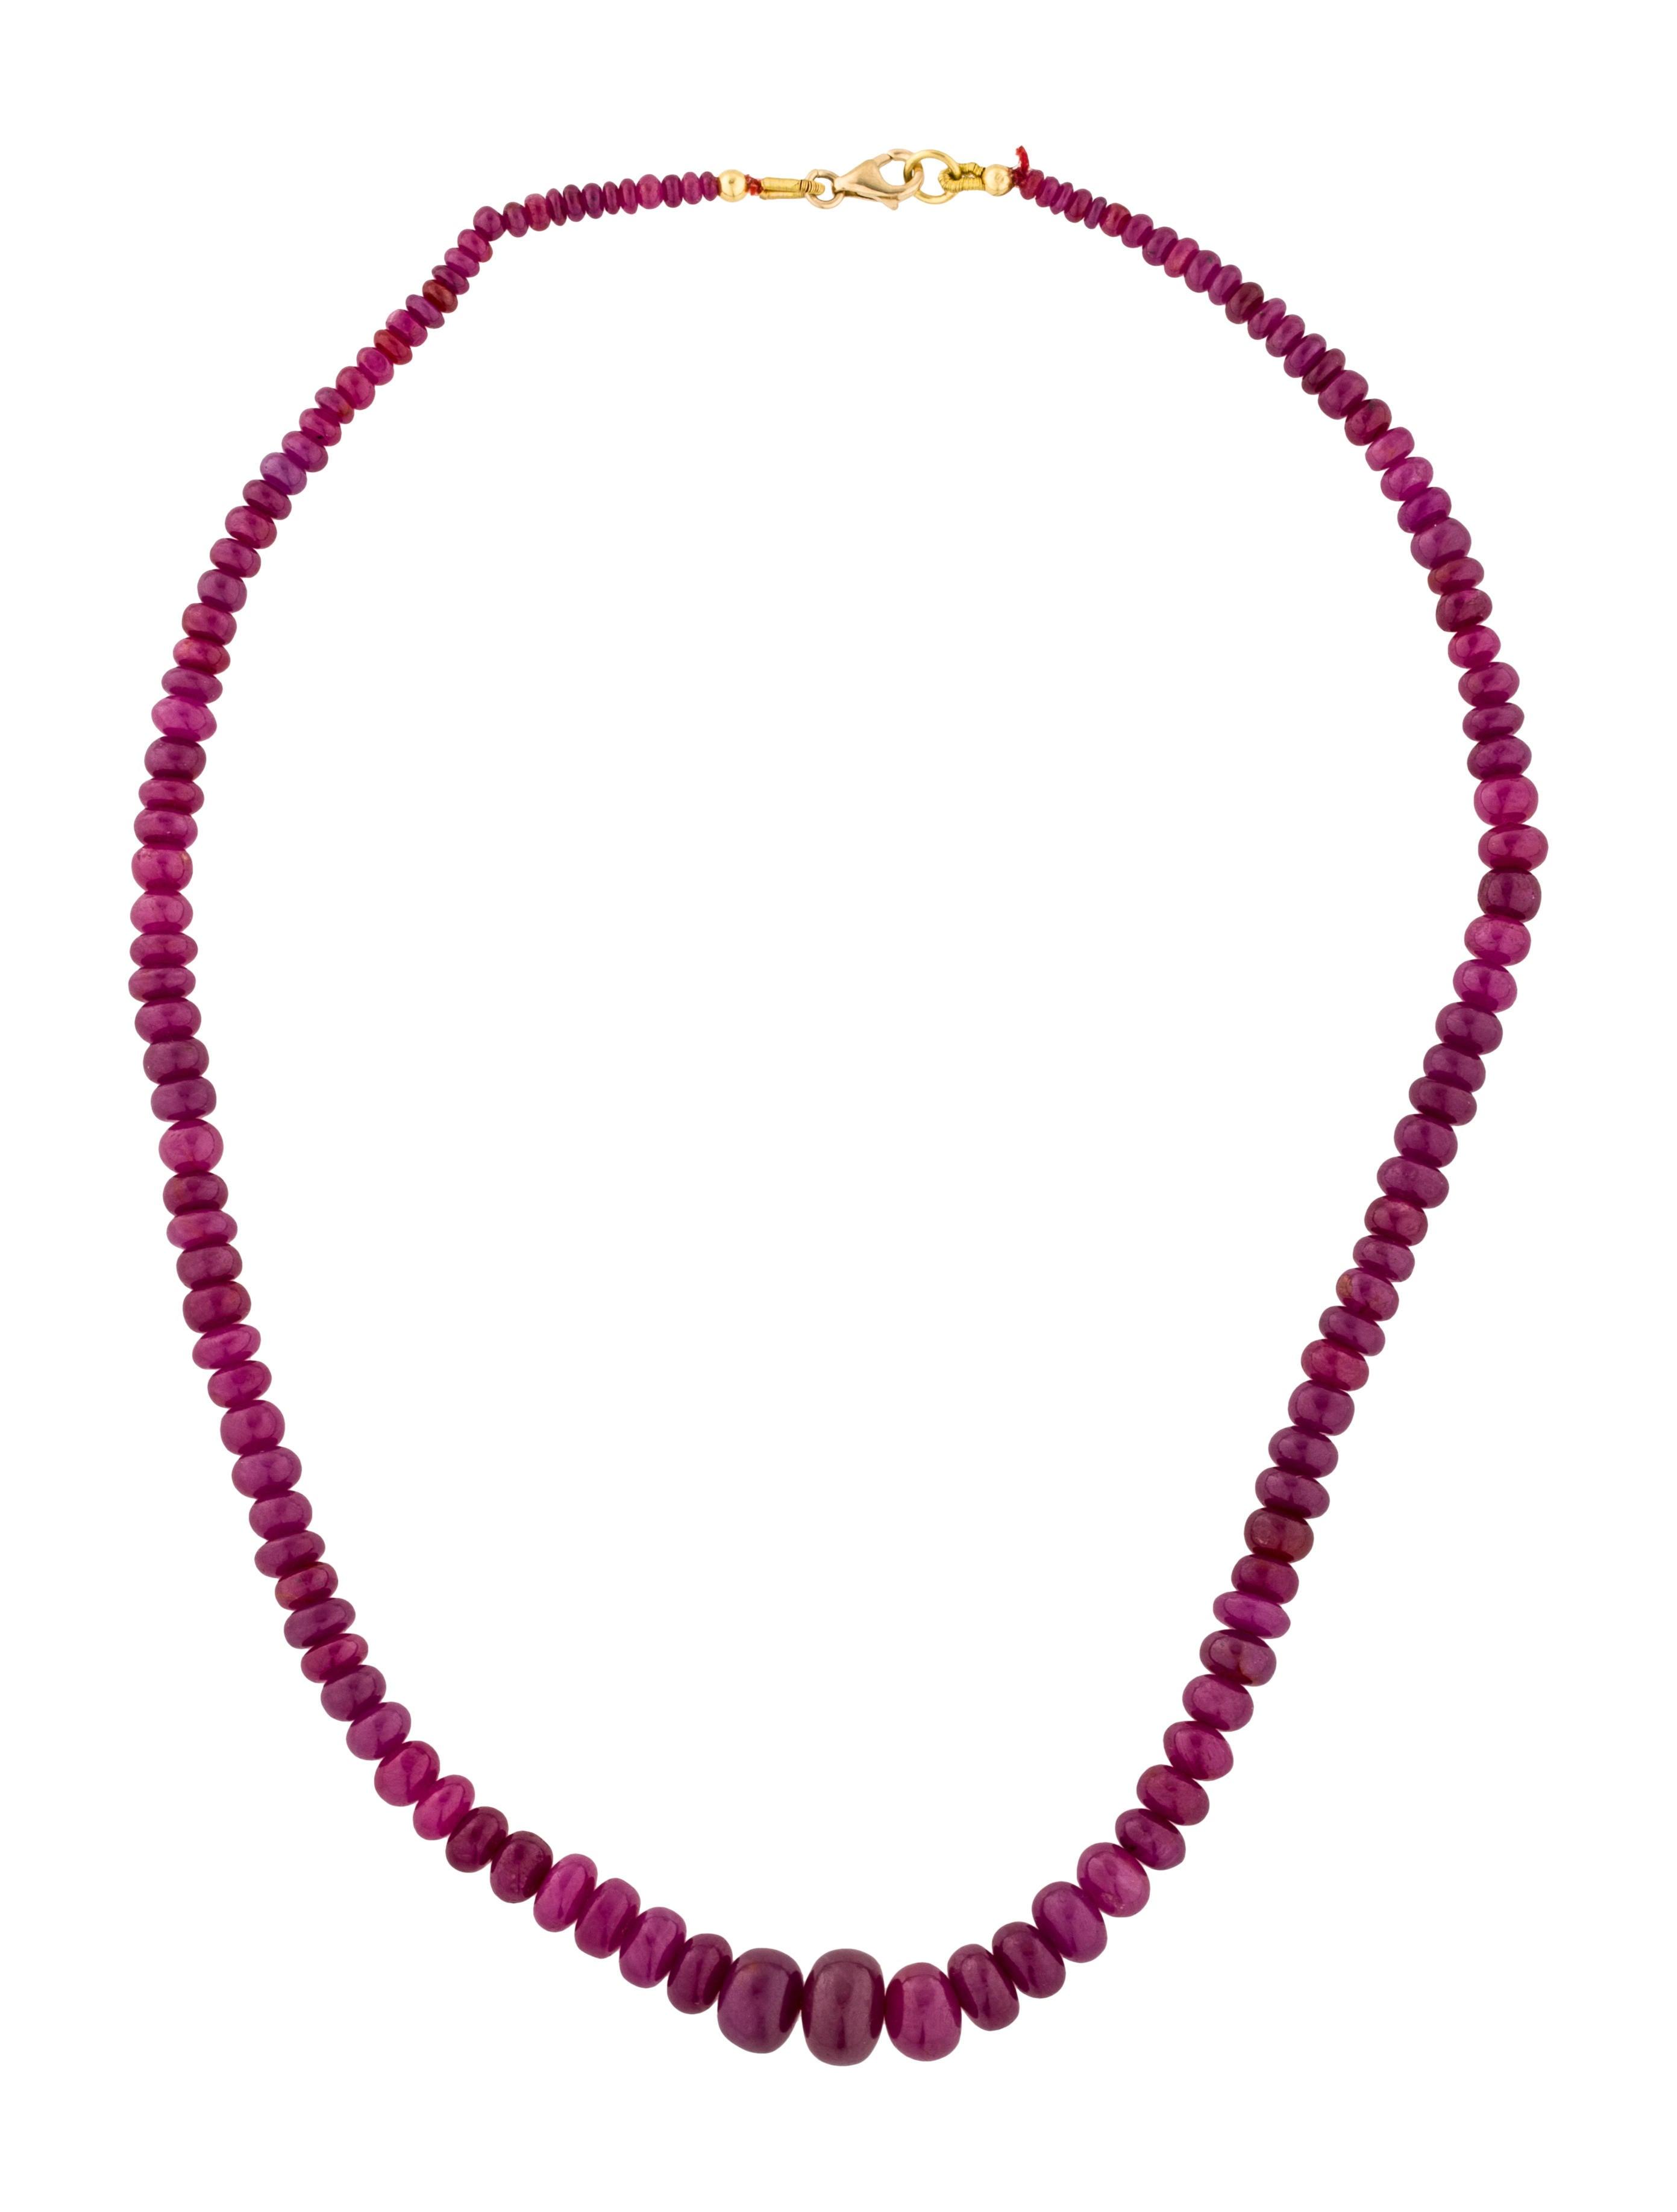 18k ruby bead strand necklace necklaces neckl32629